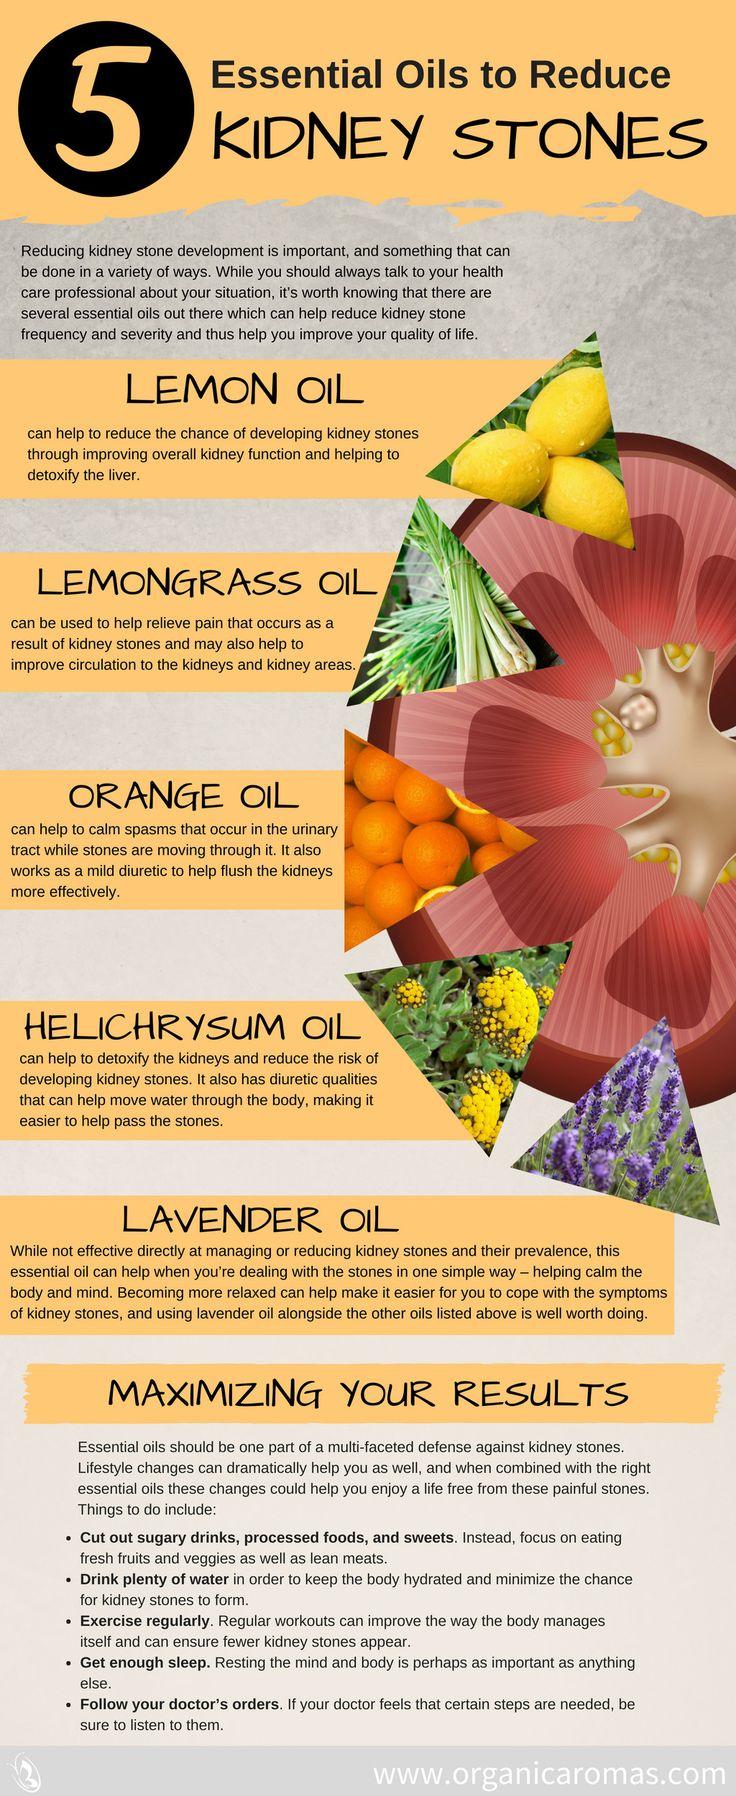 Top 5 Essential Oils to Reduce Kidney Stones - Organic Aromas